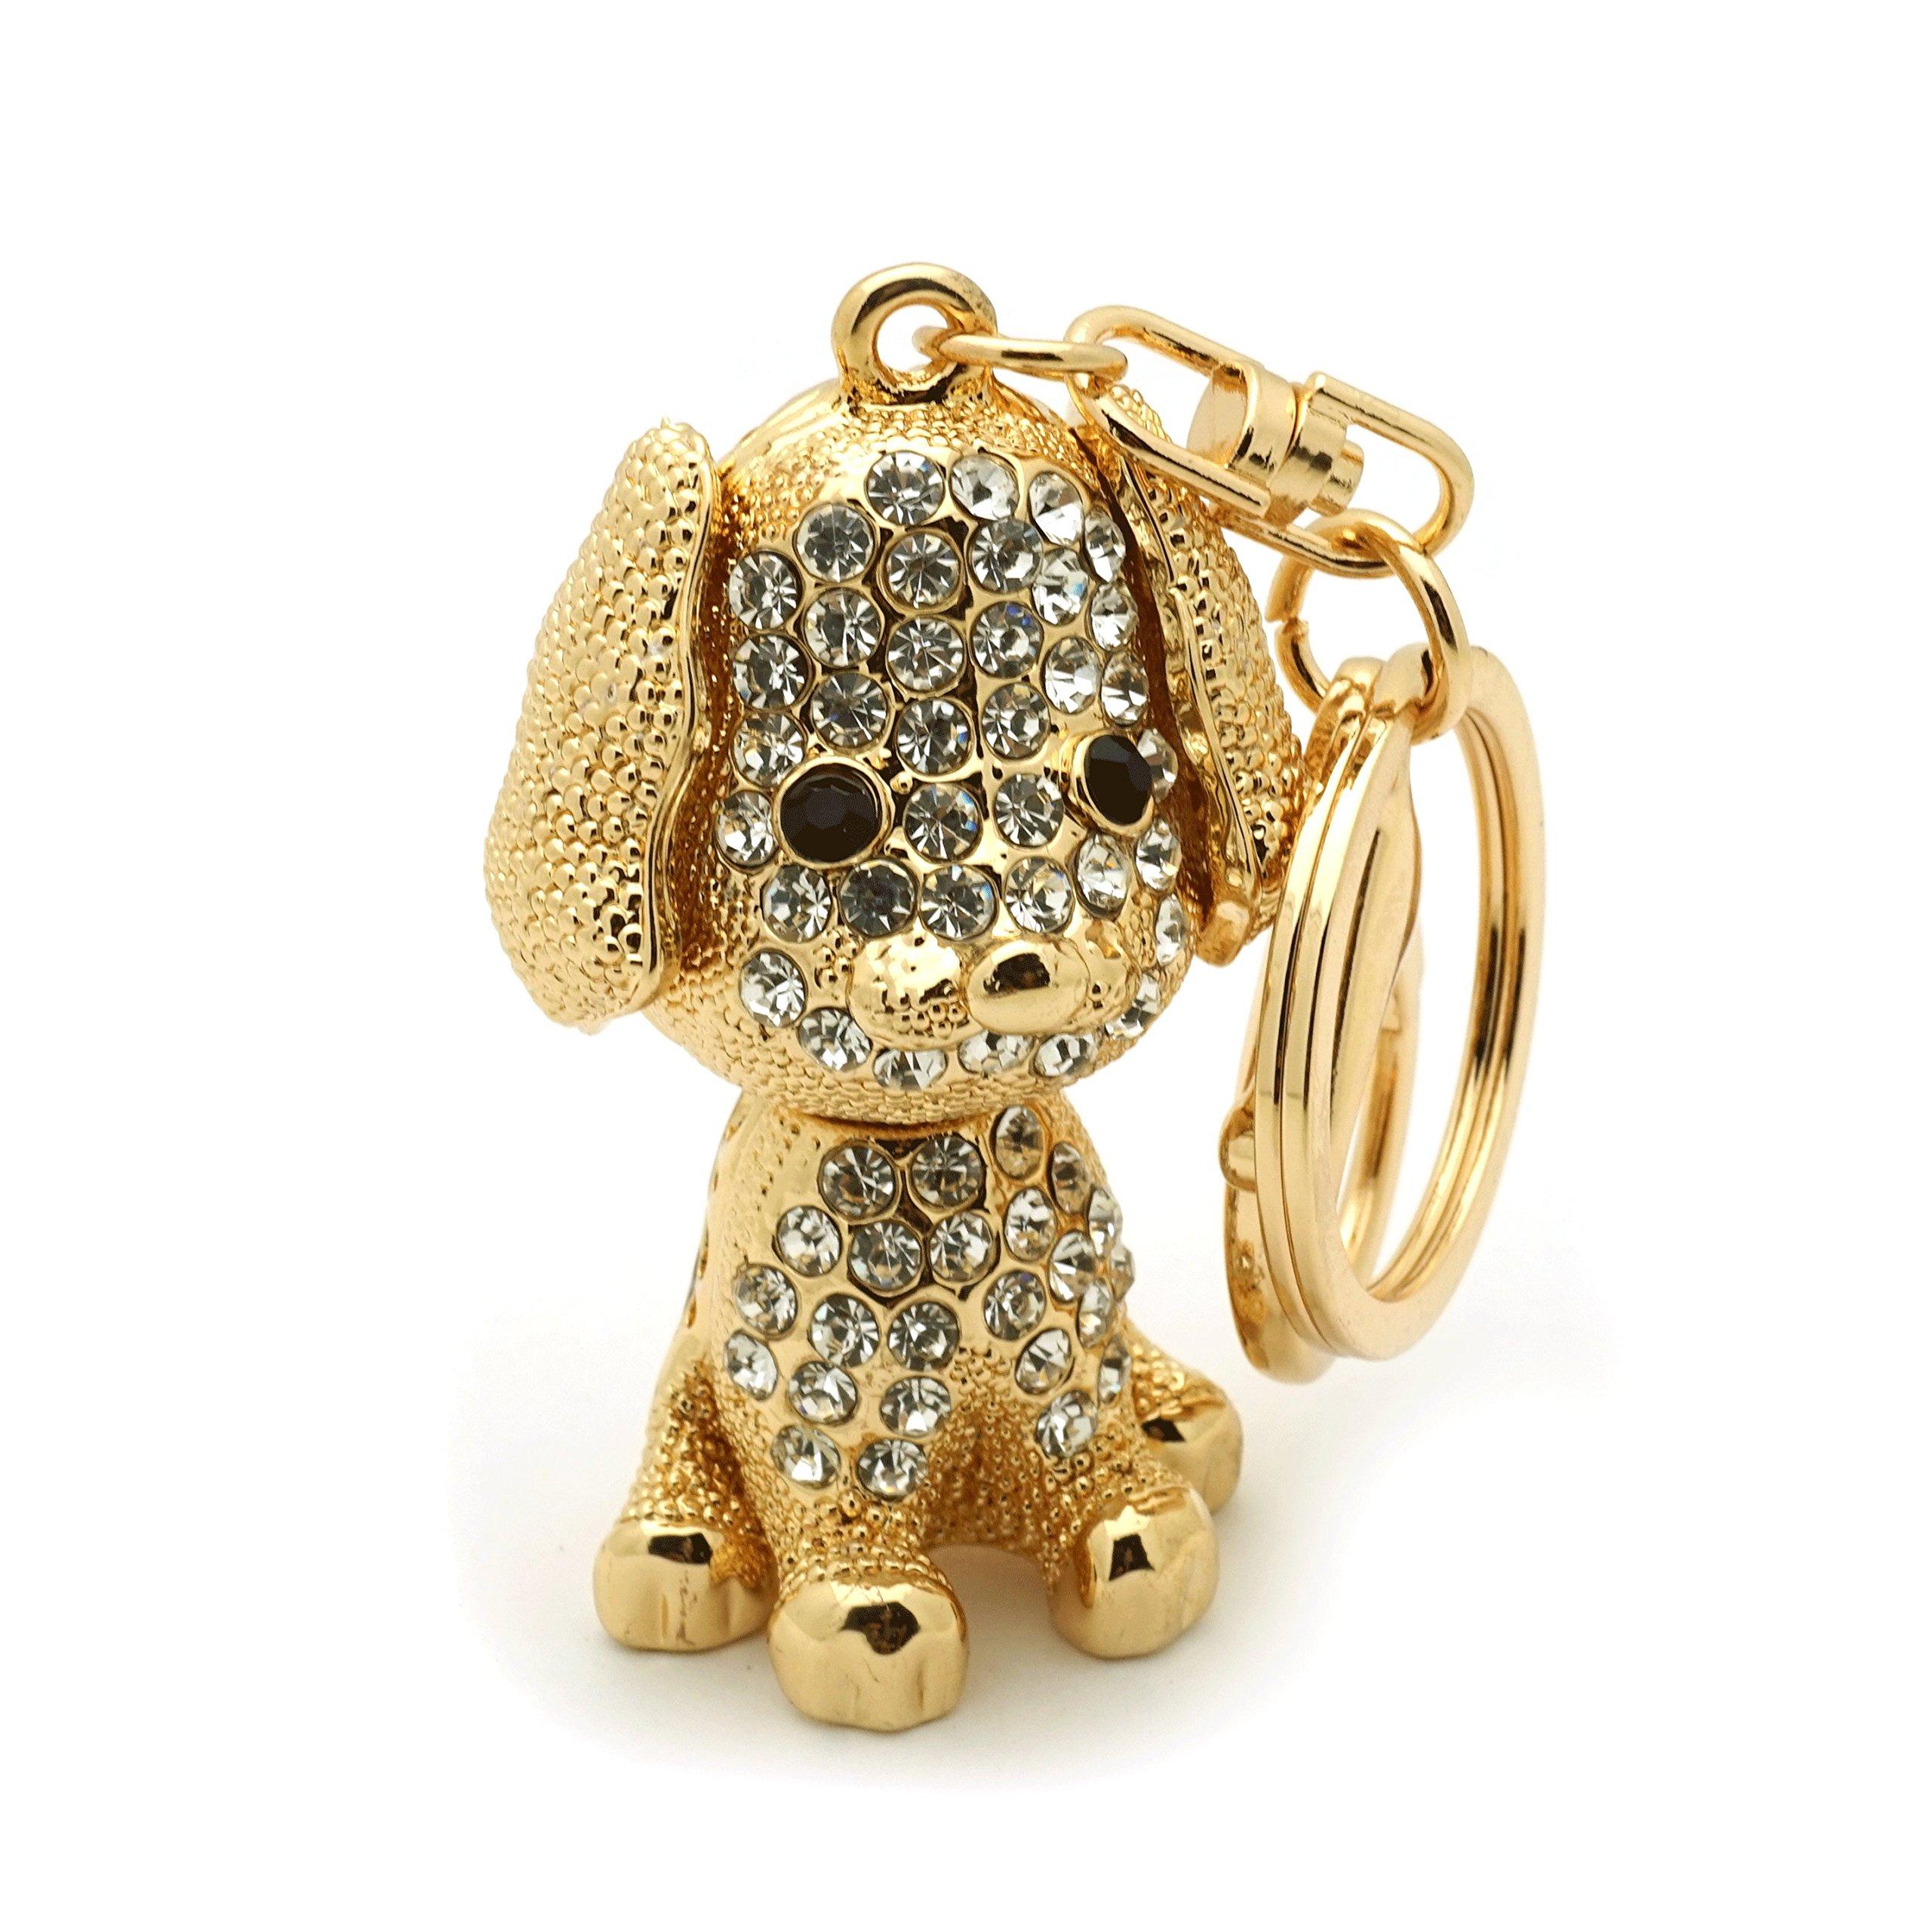 Teri's Boutique Dog Puppy Lover Great Gift Rhinestone 3D Women Kids Charm Keychain (Gold)